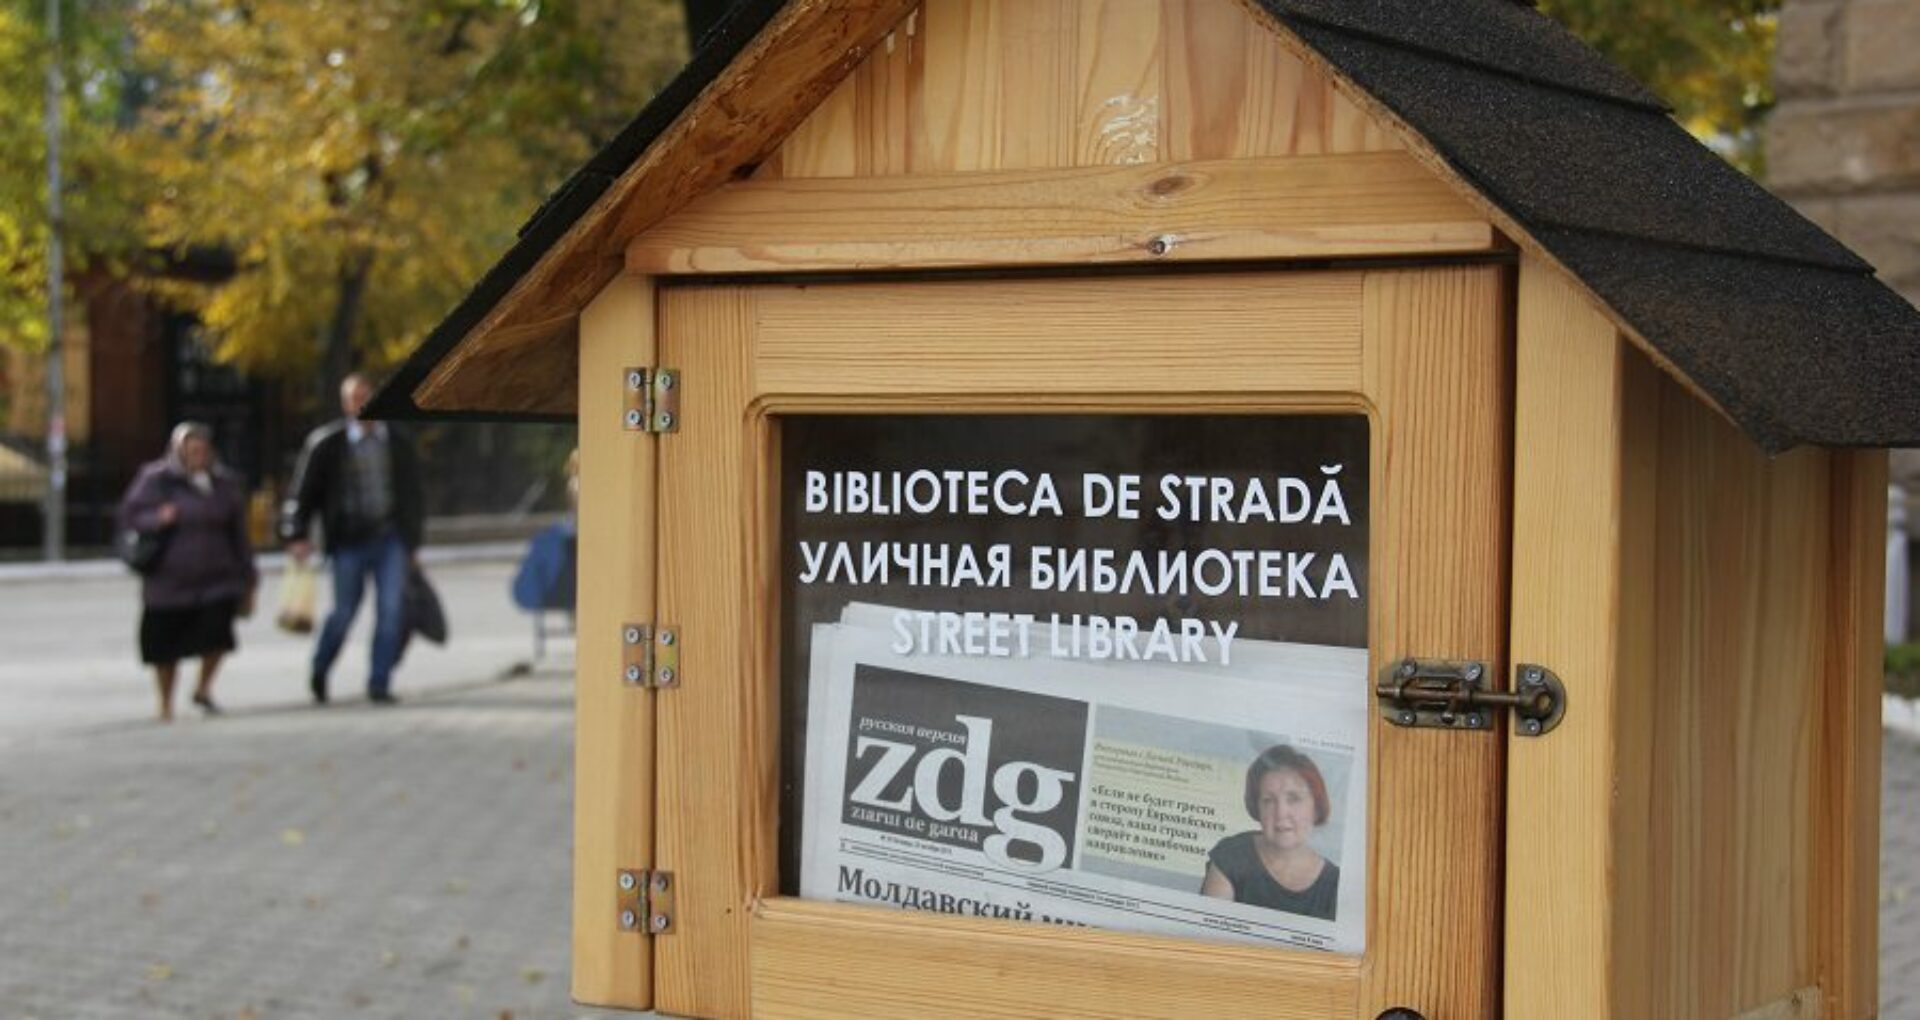 Citiți joi în ZdG